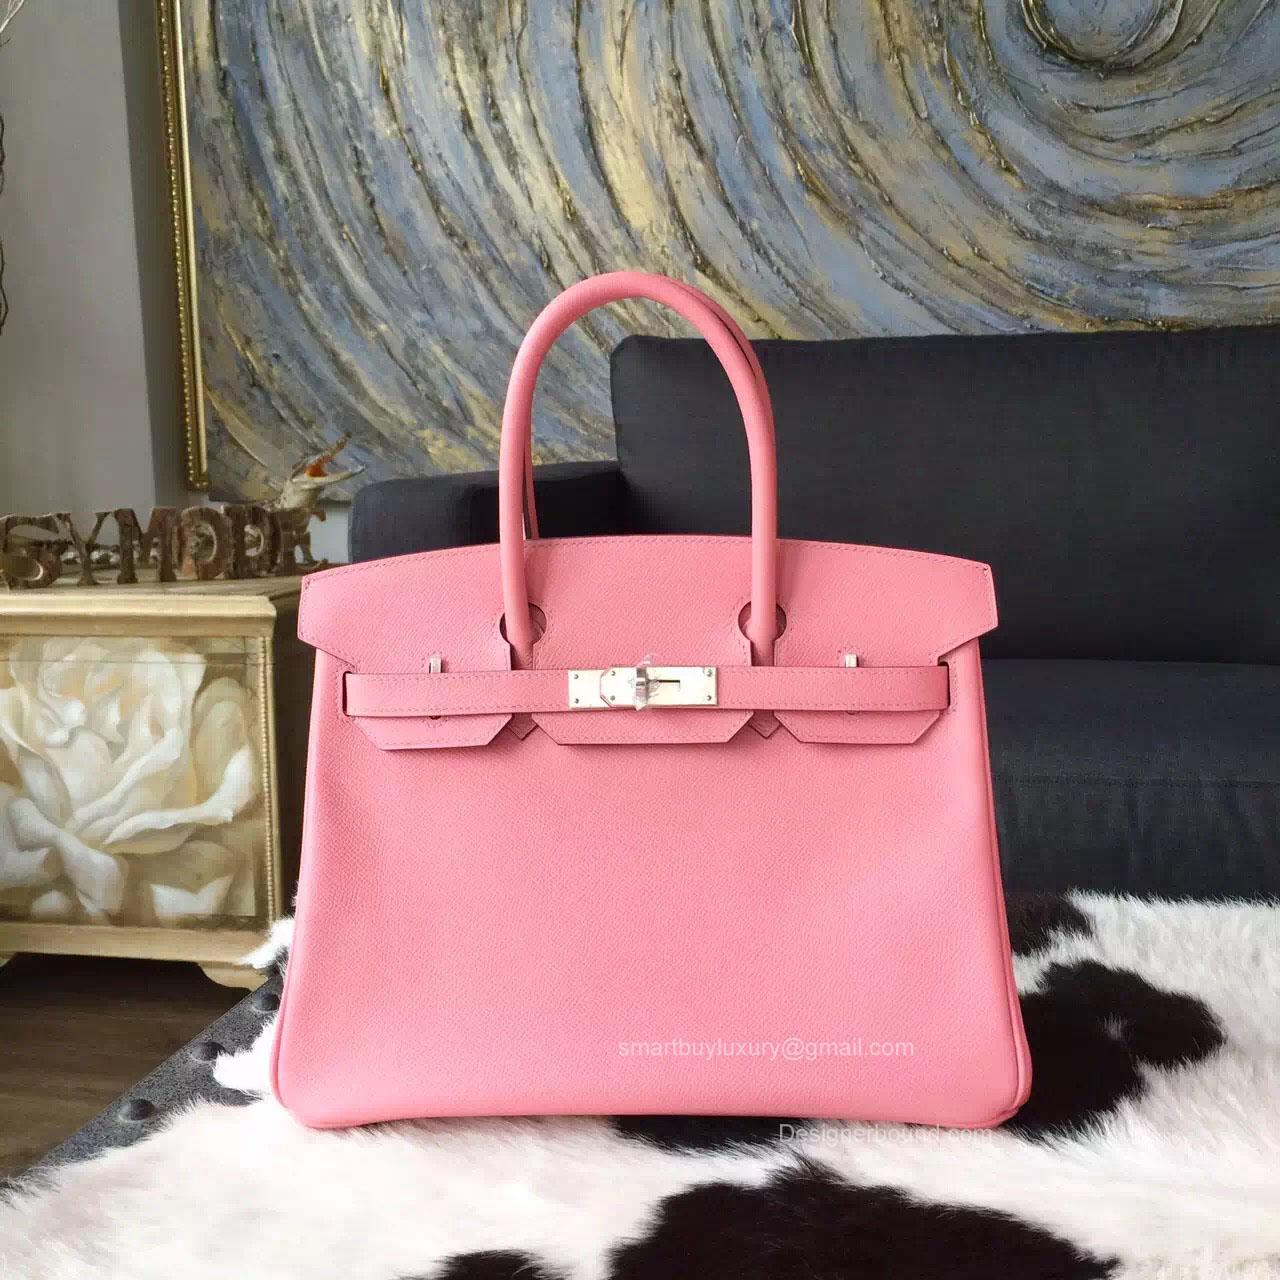 where to buy hermes handbags - hermes birkin bag 30 rose confetti epsom leather silver hardware